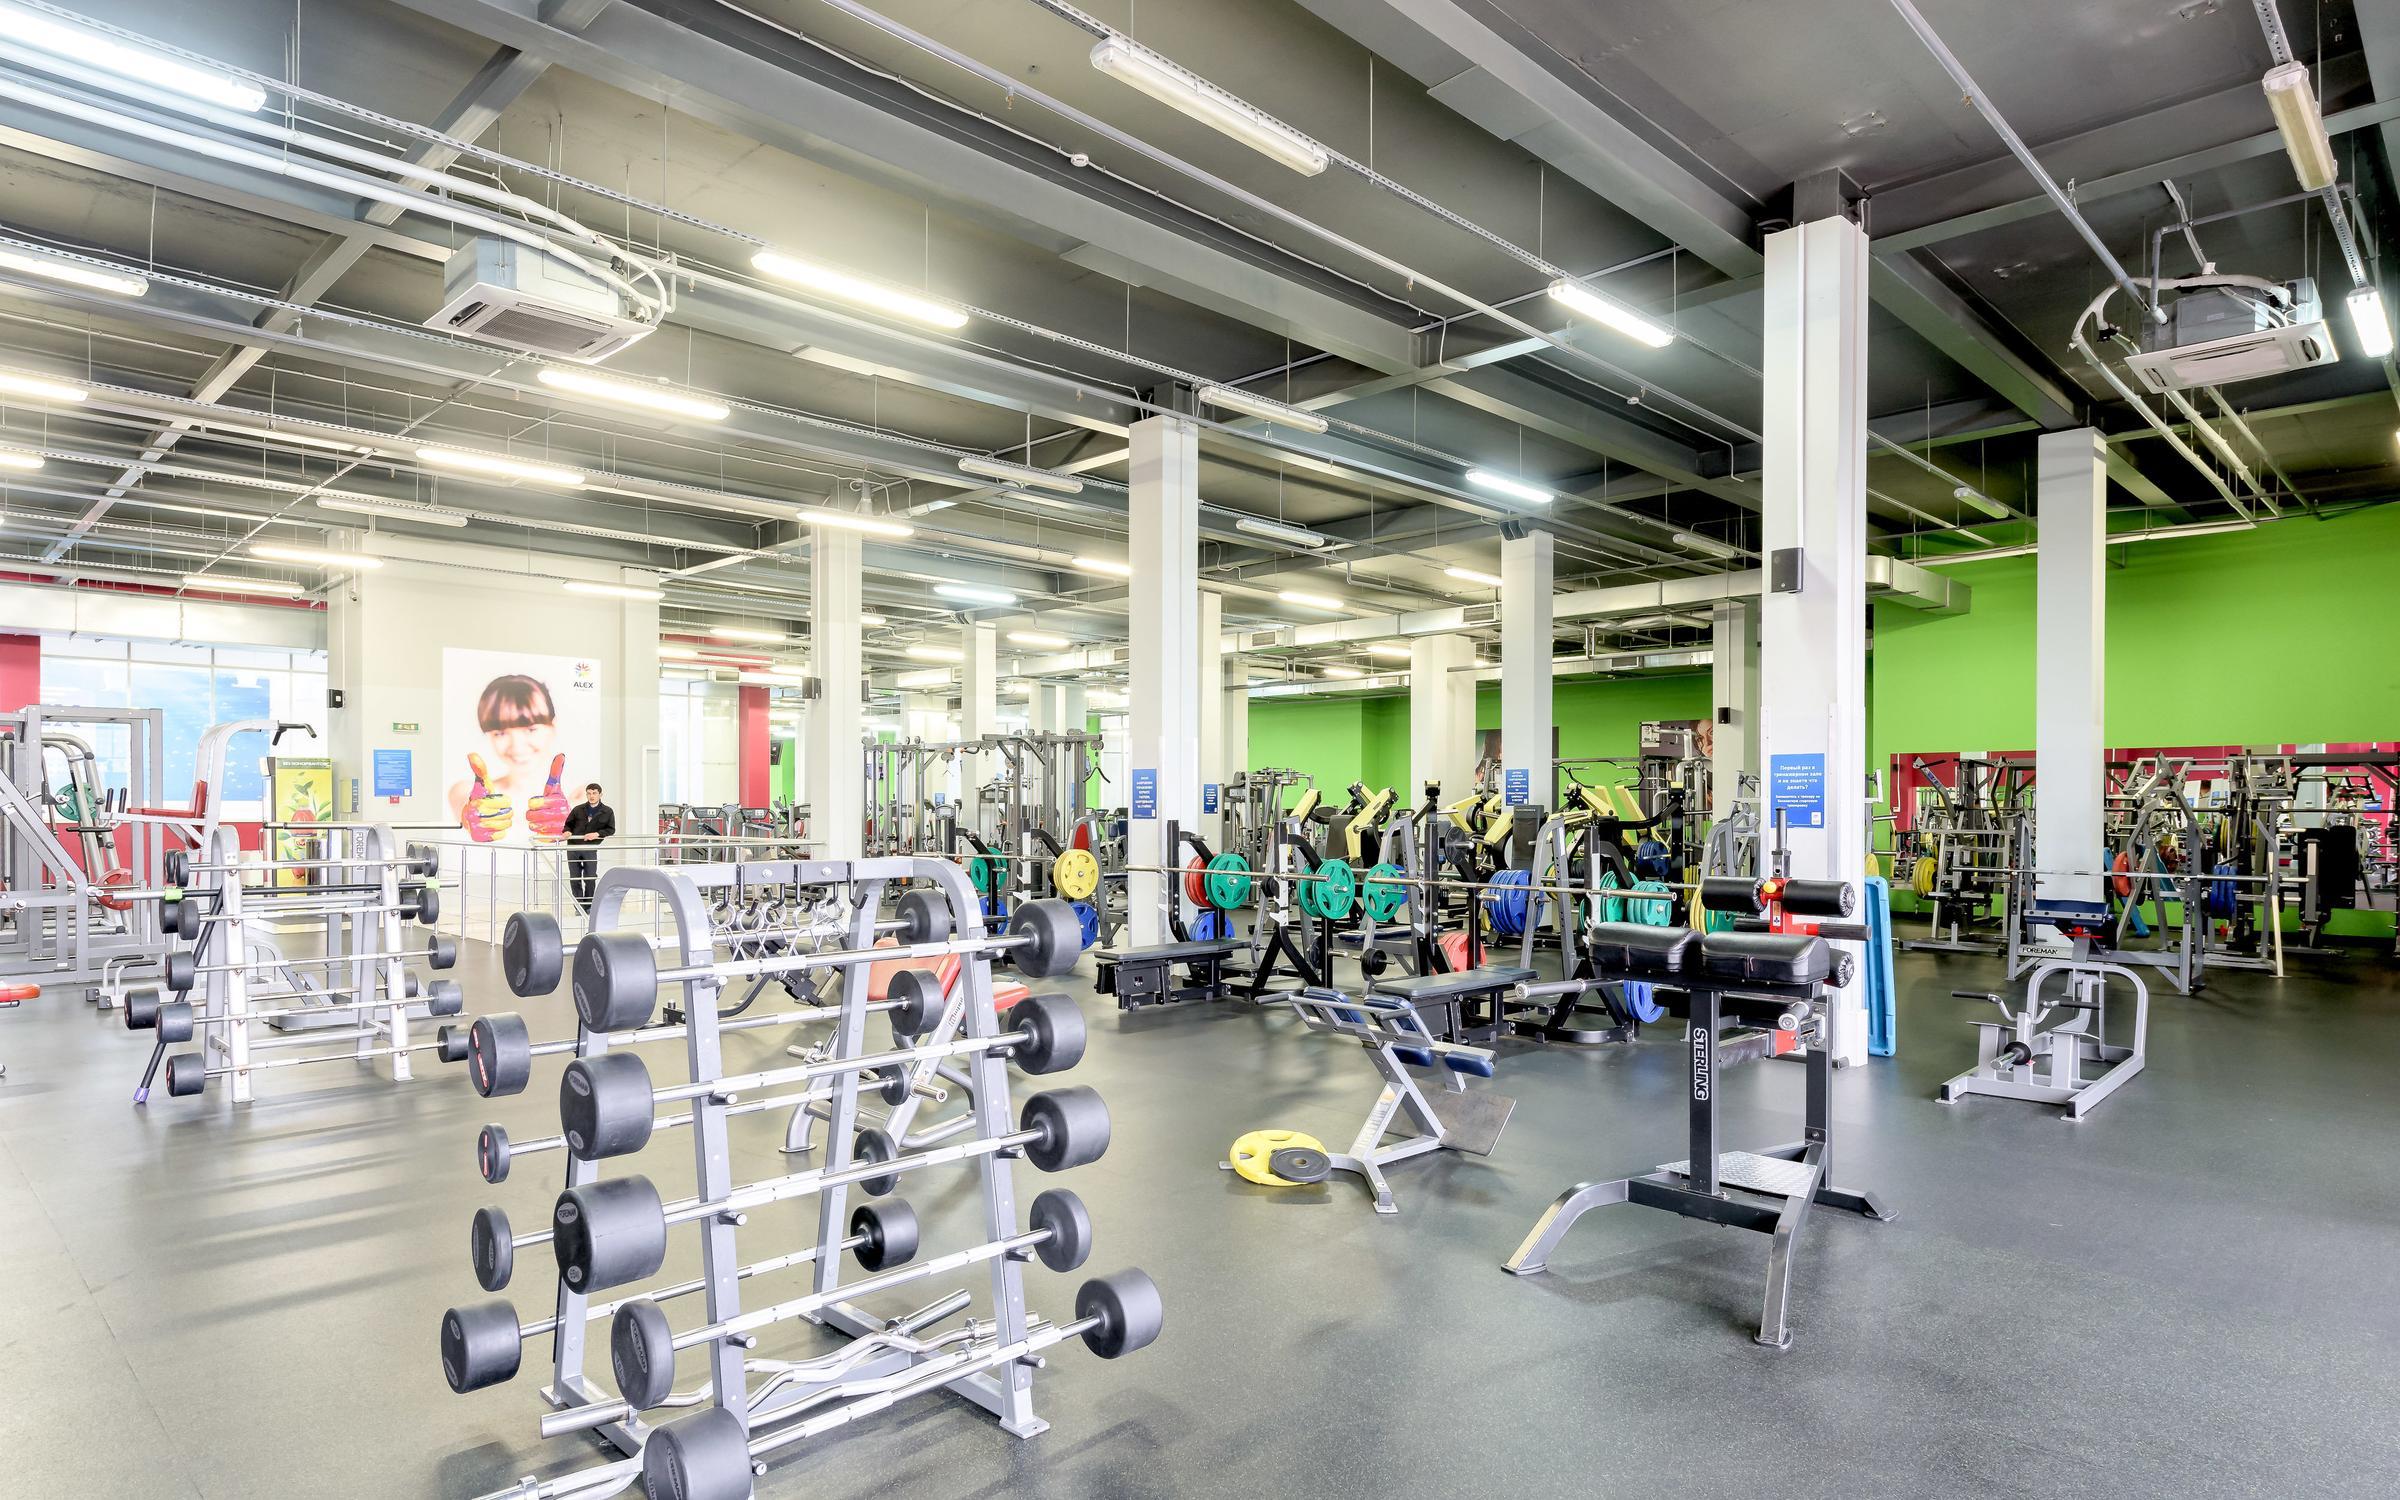 фотография Фитнес-клуба ALEX fitness Кудрово на метро Улица Дыбенко